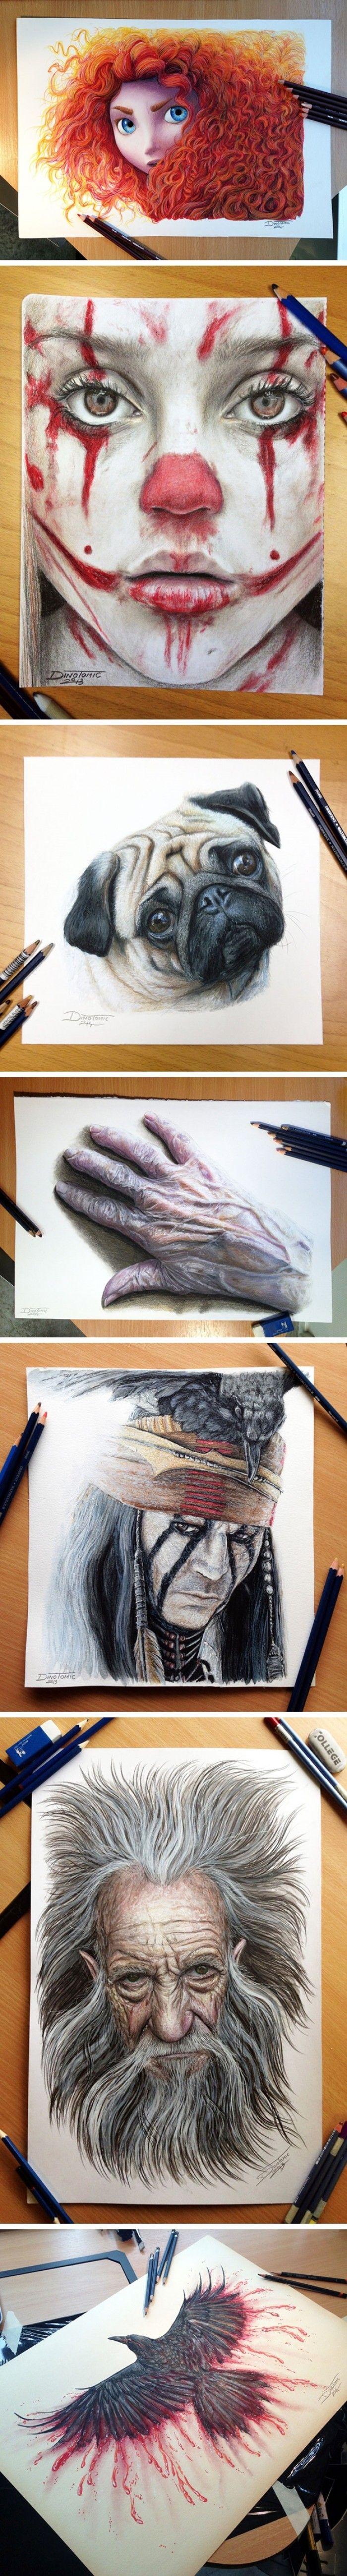 Muhteşem Gerçekçi Çizimler - Dino Tomic www.4finite.com